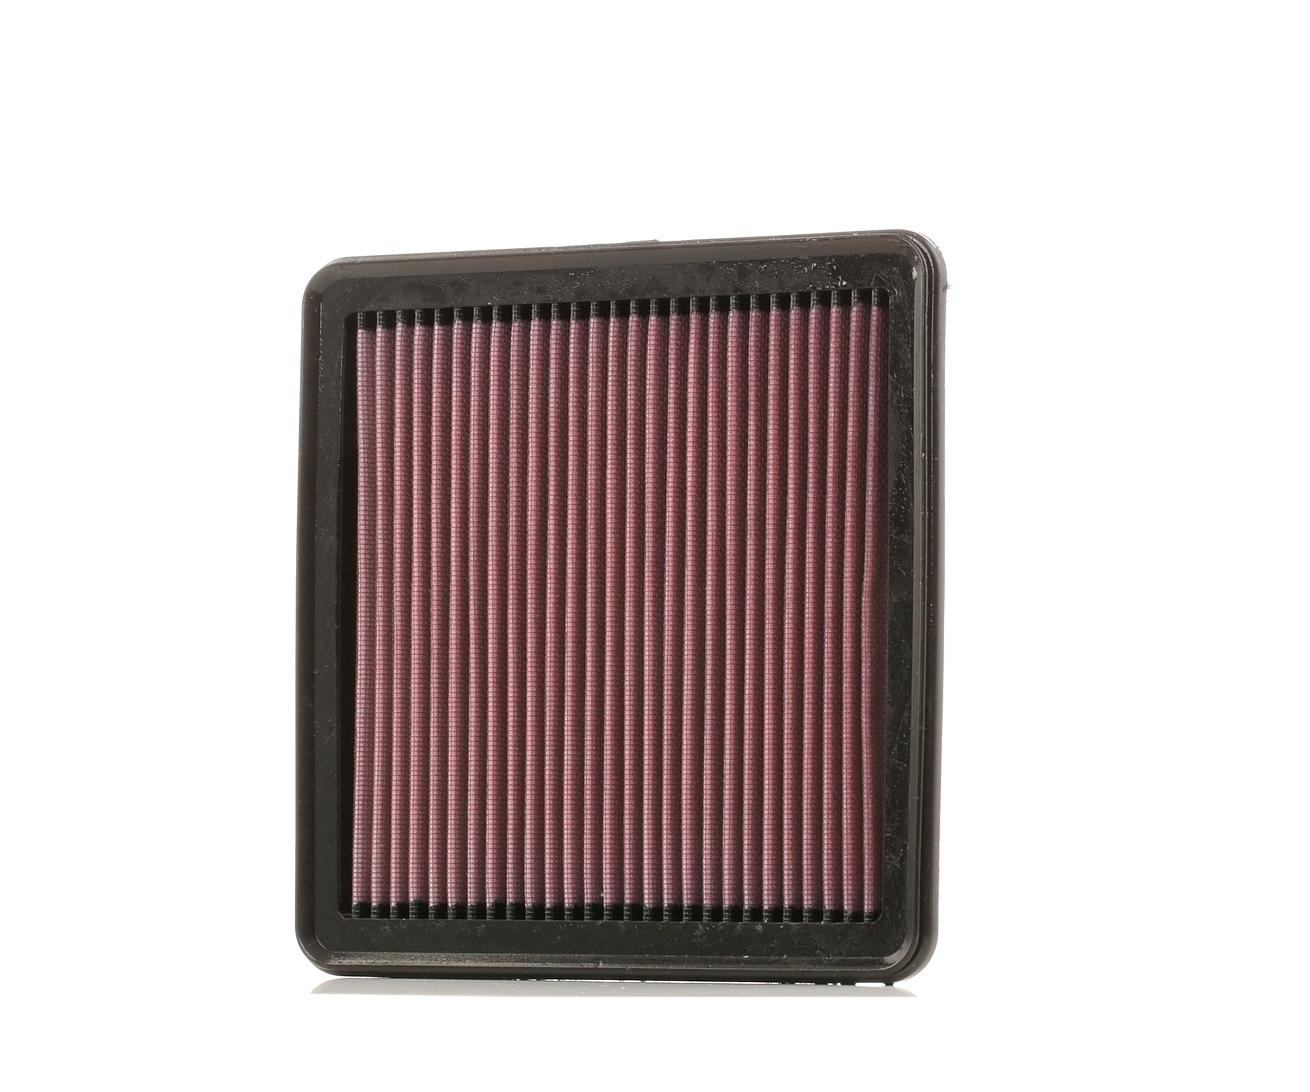 Luchtfilter K&N Filters 33-2304 waardering